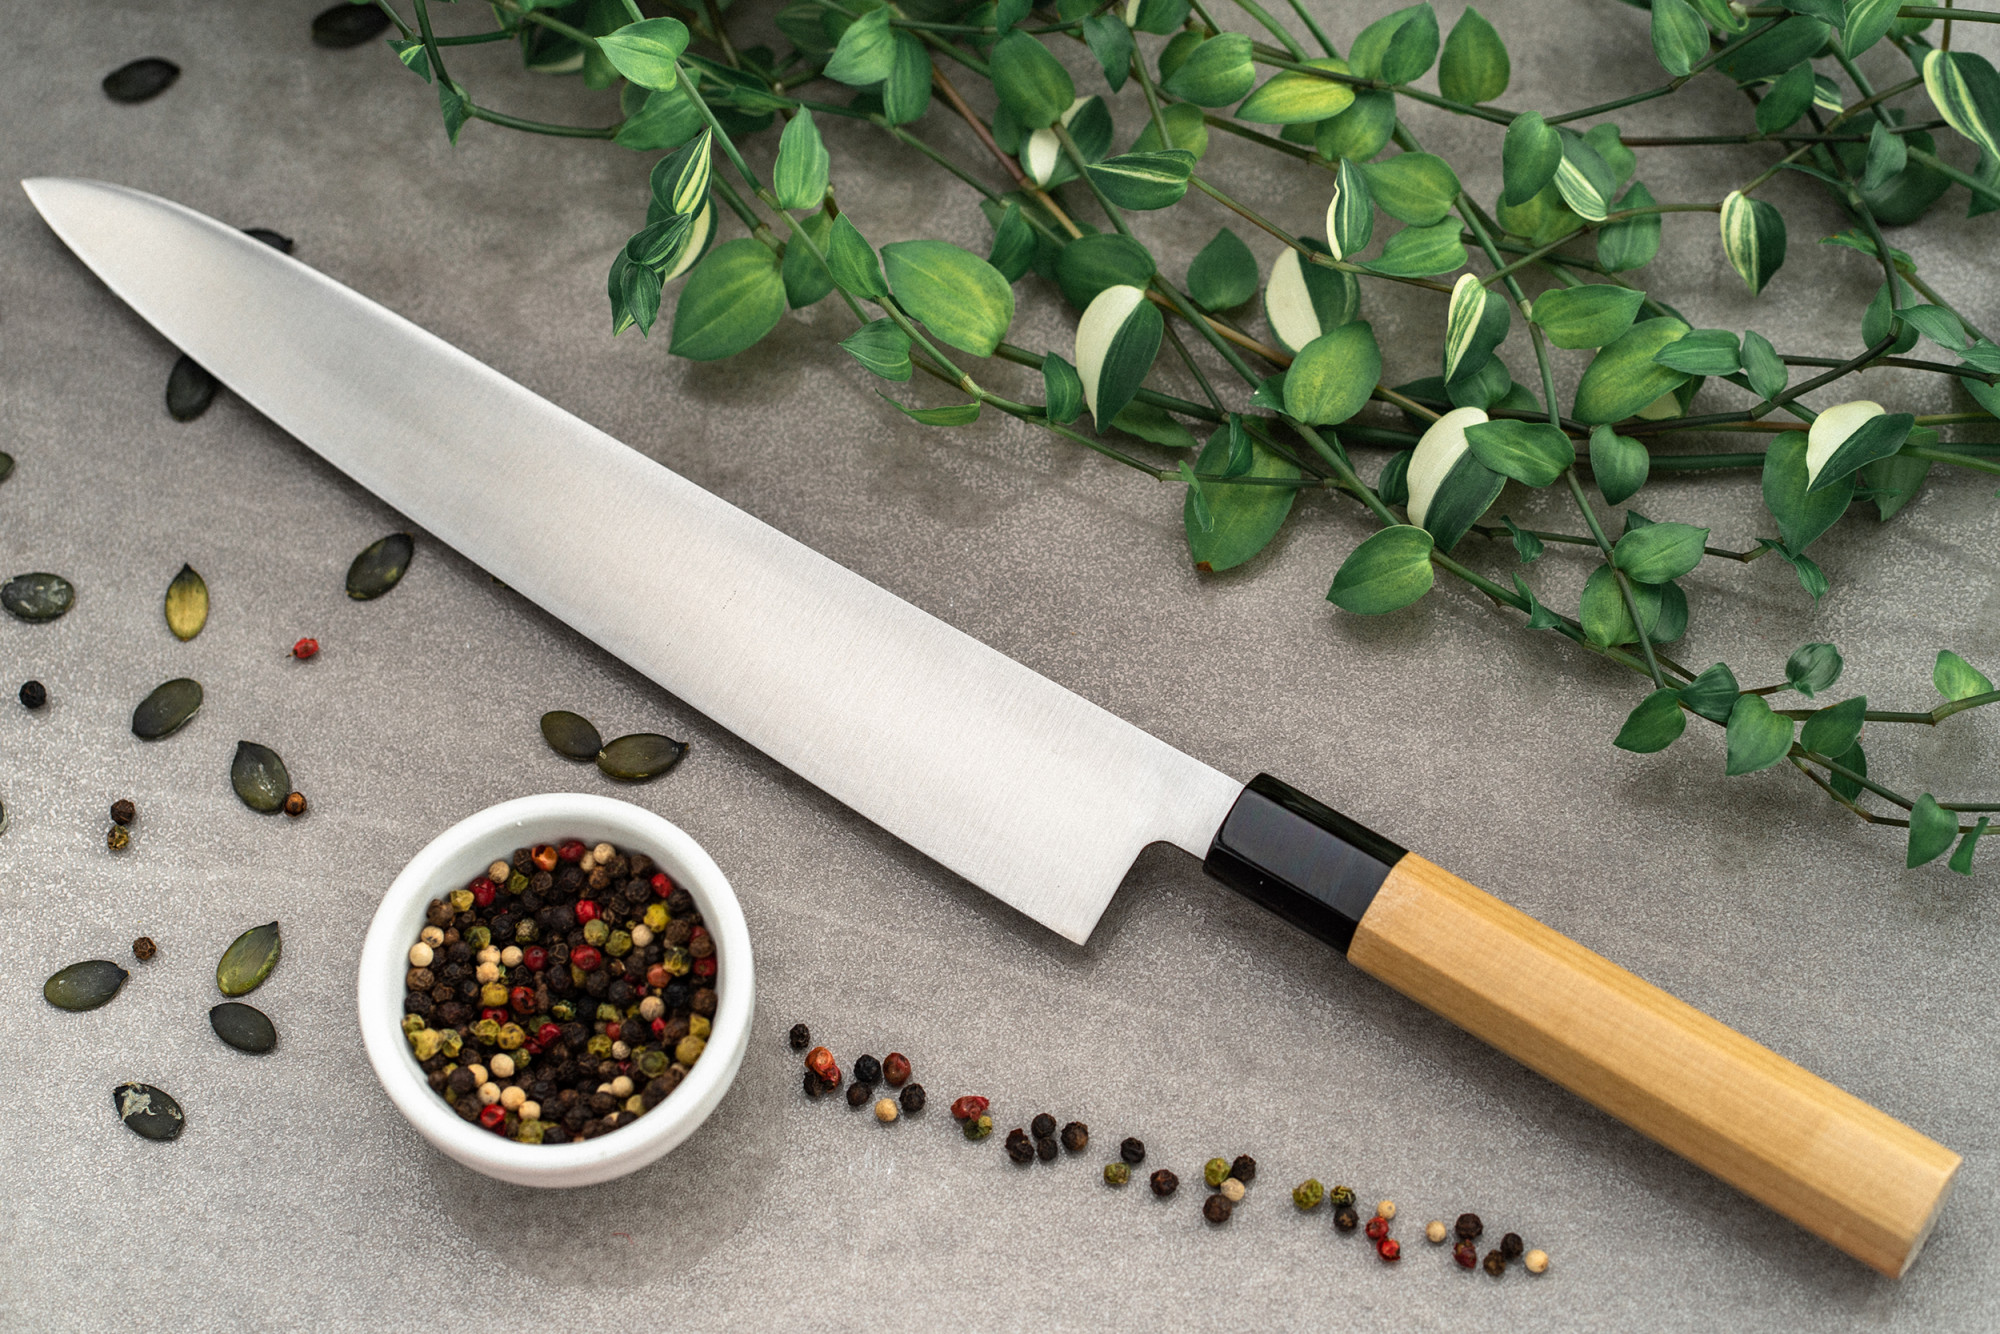 Yoshihiro Yamawaki Sujihiki 270mm AUS8 japanese kitchen knives